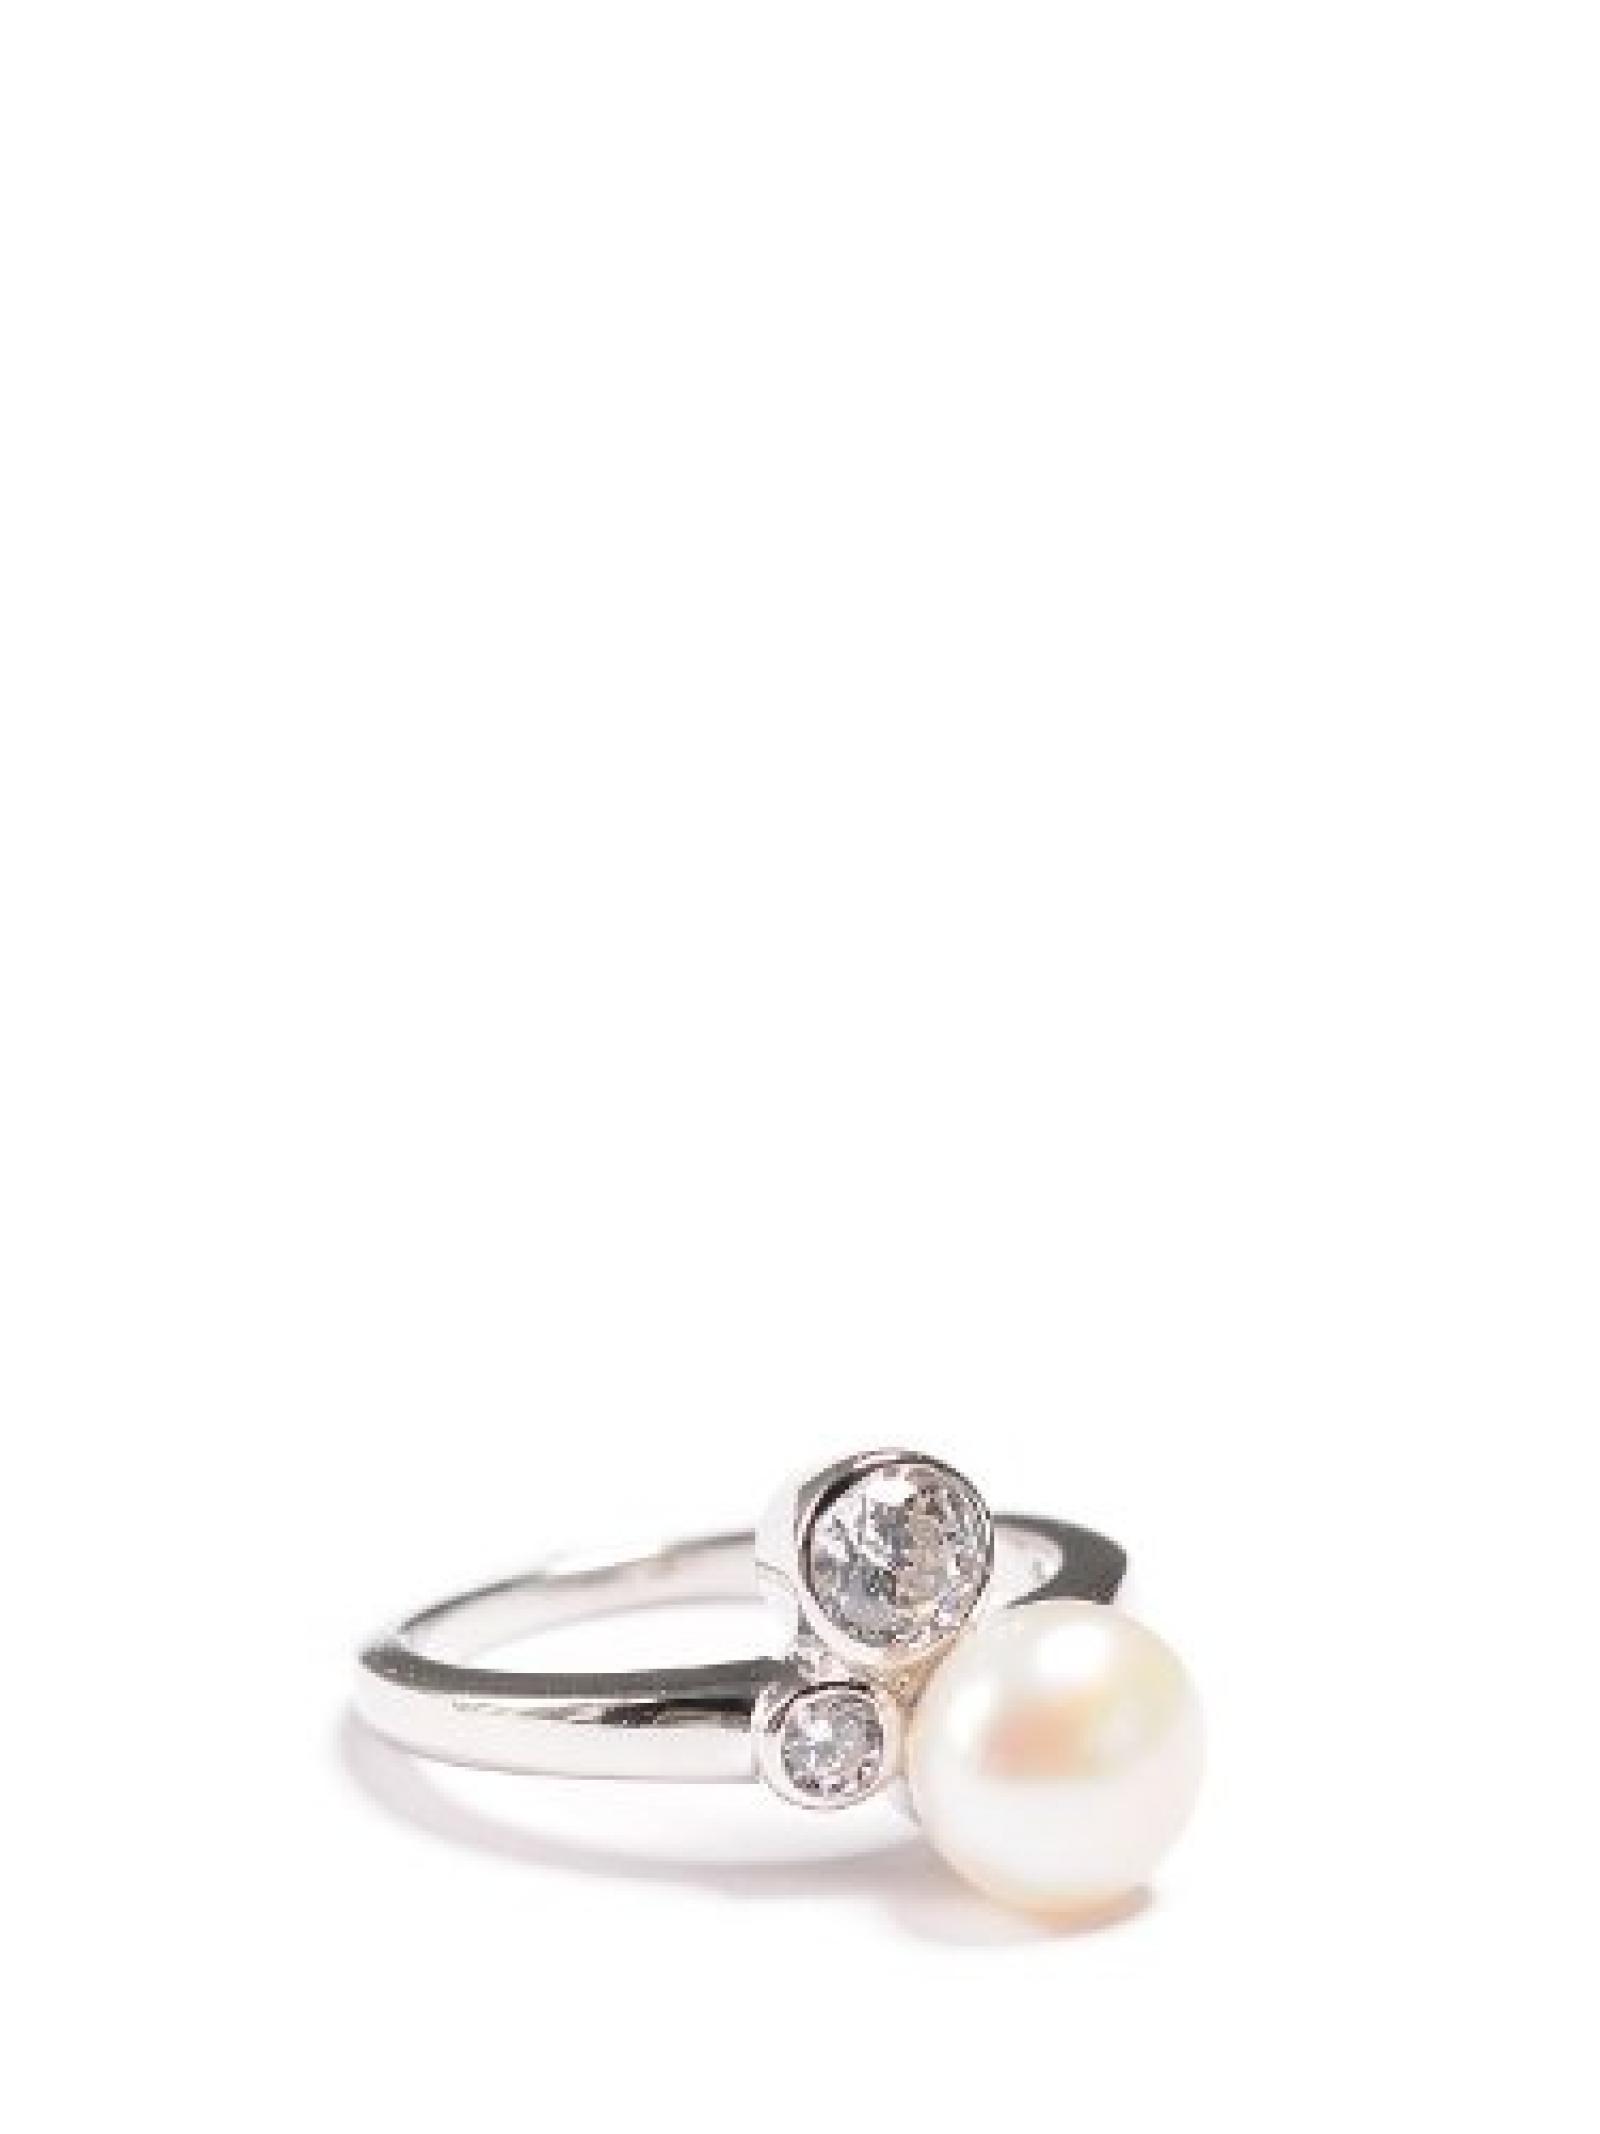 Valero Pearls Ring silber, 18,5